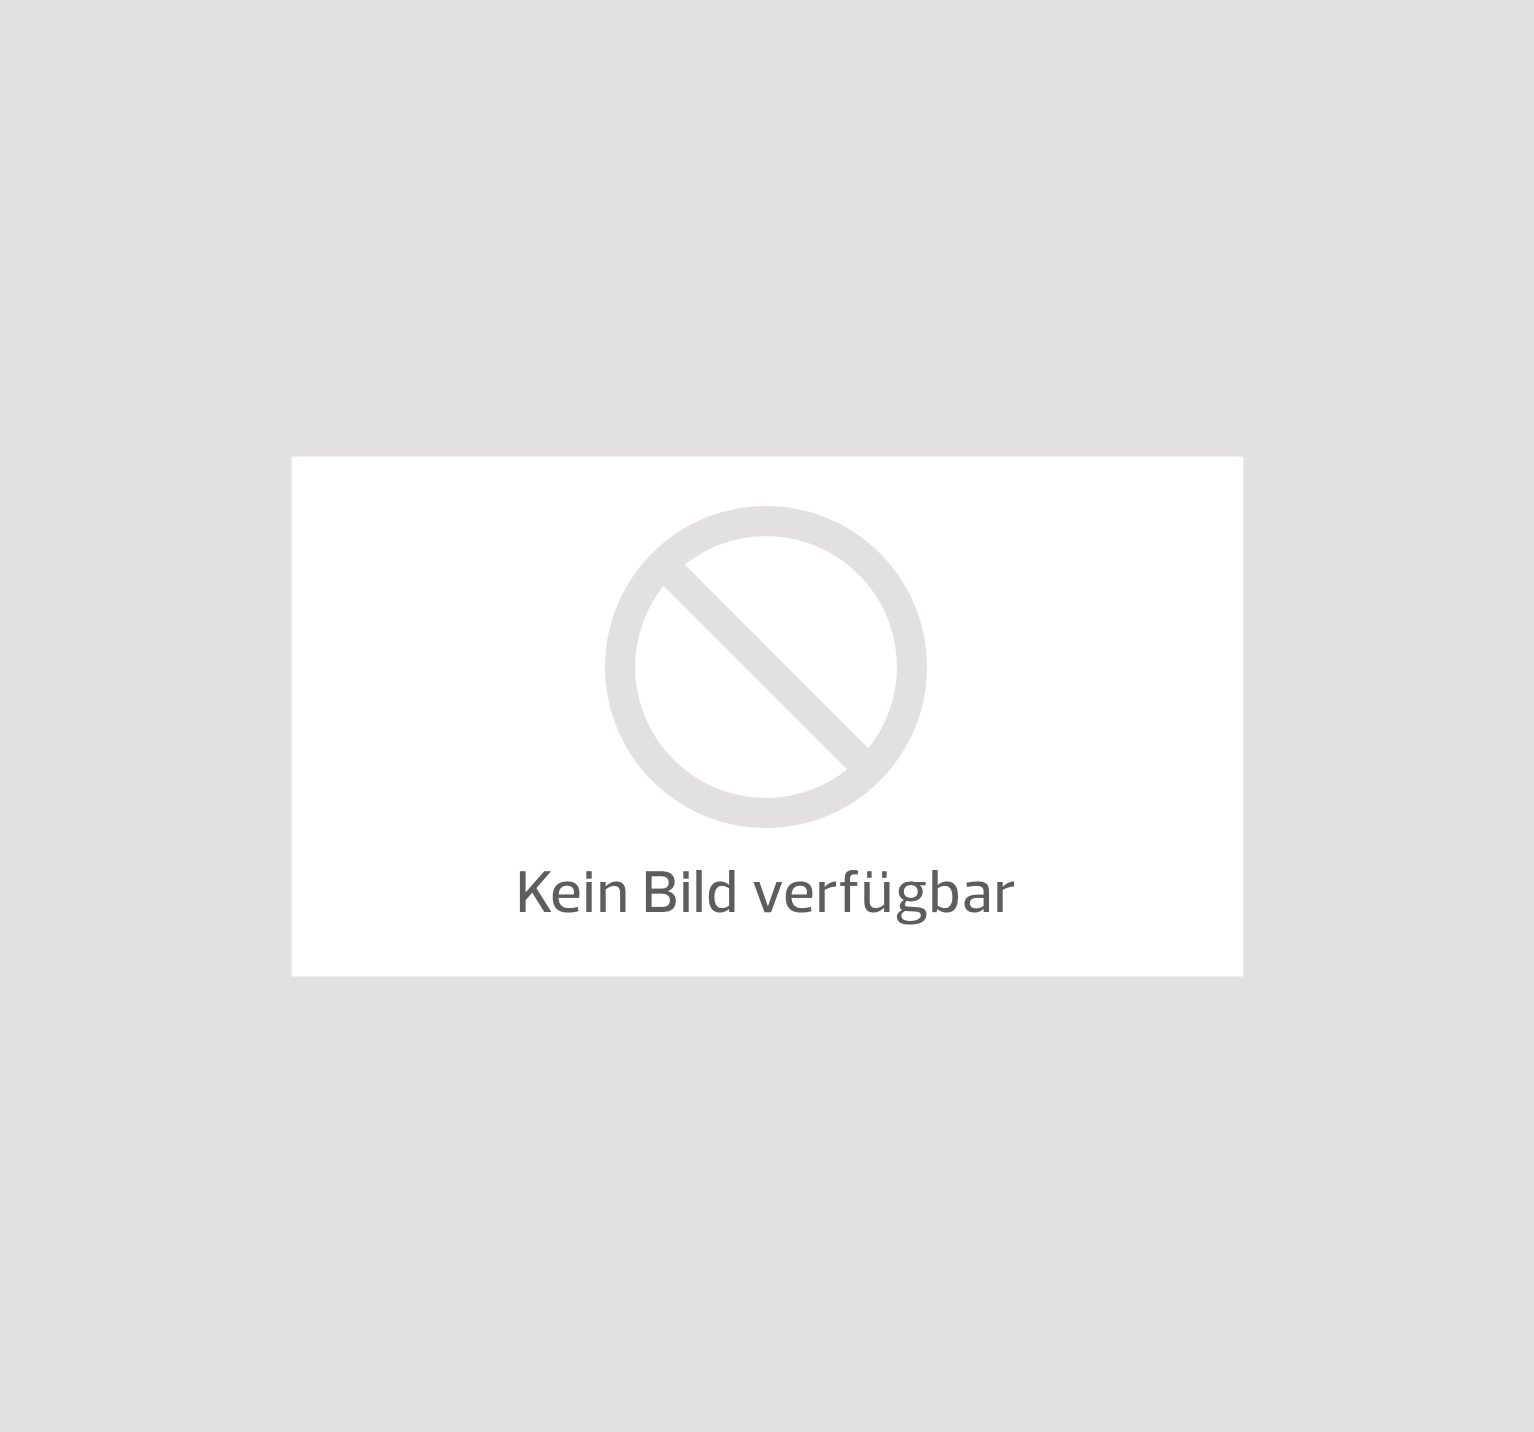 Karl May Festspiele Tryp By Wyndham Bad Bramstedt Bad